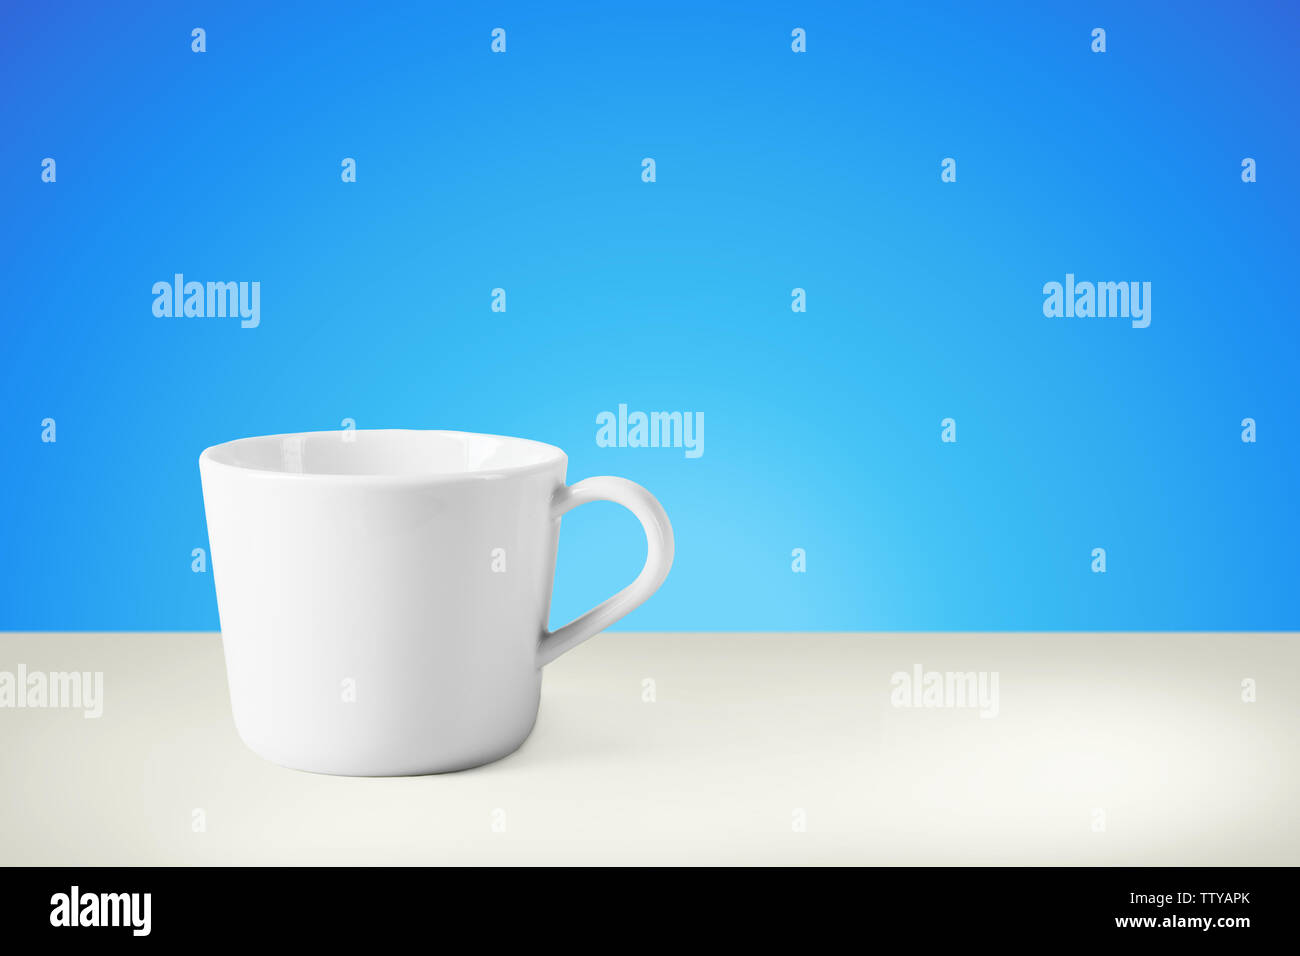 Copyspce Stock Photos & Copyspce Stock Images - Alamy